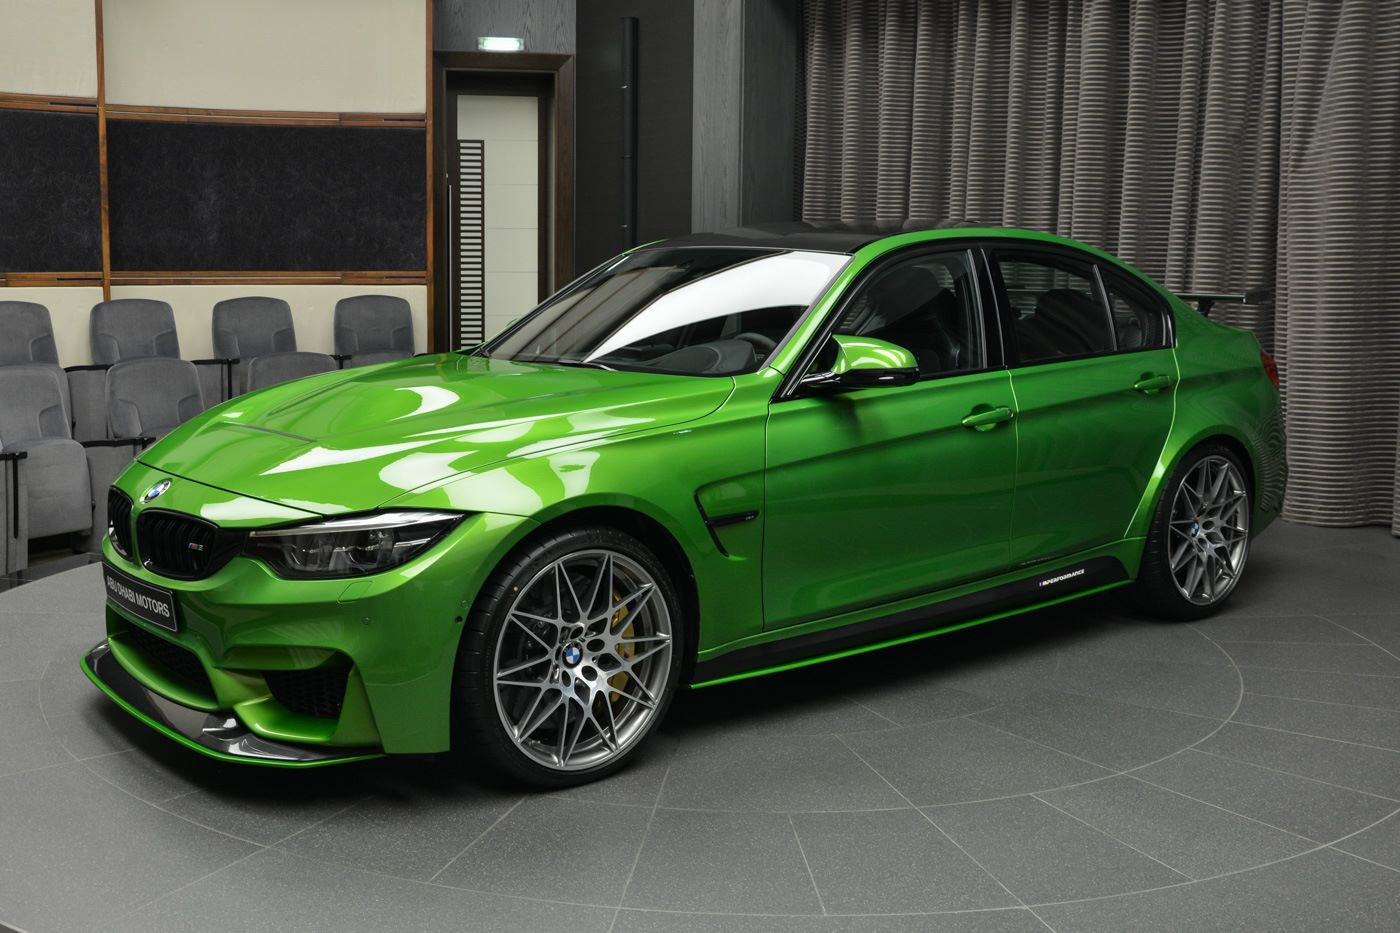 BMW_M3_Java_Green_03